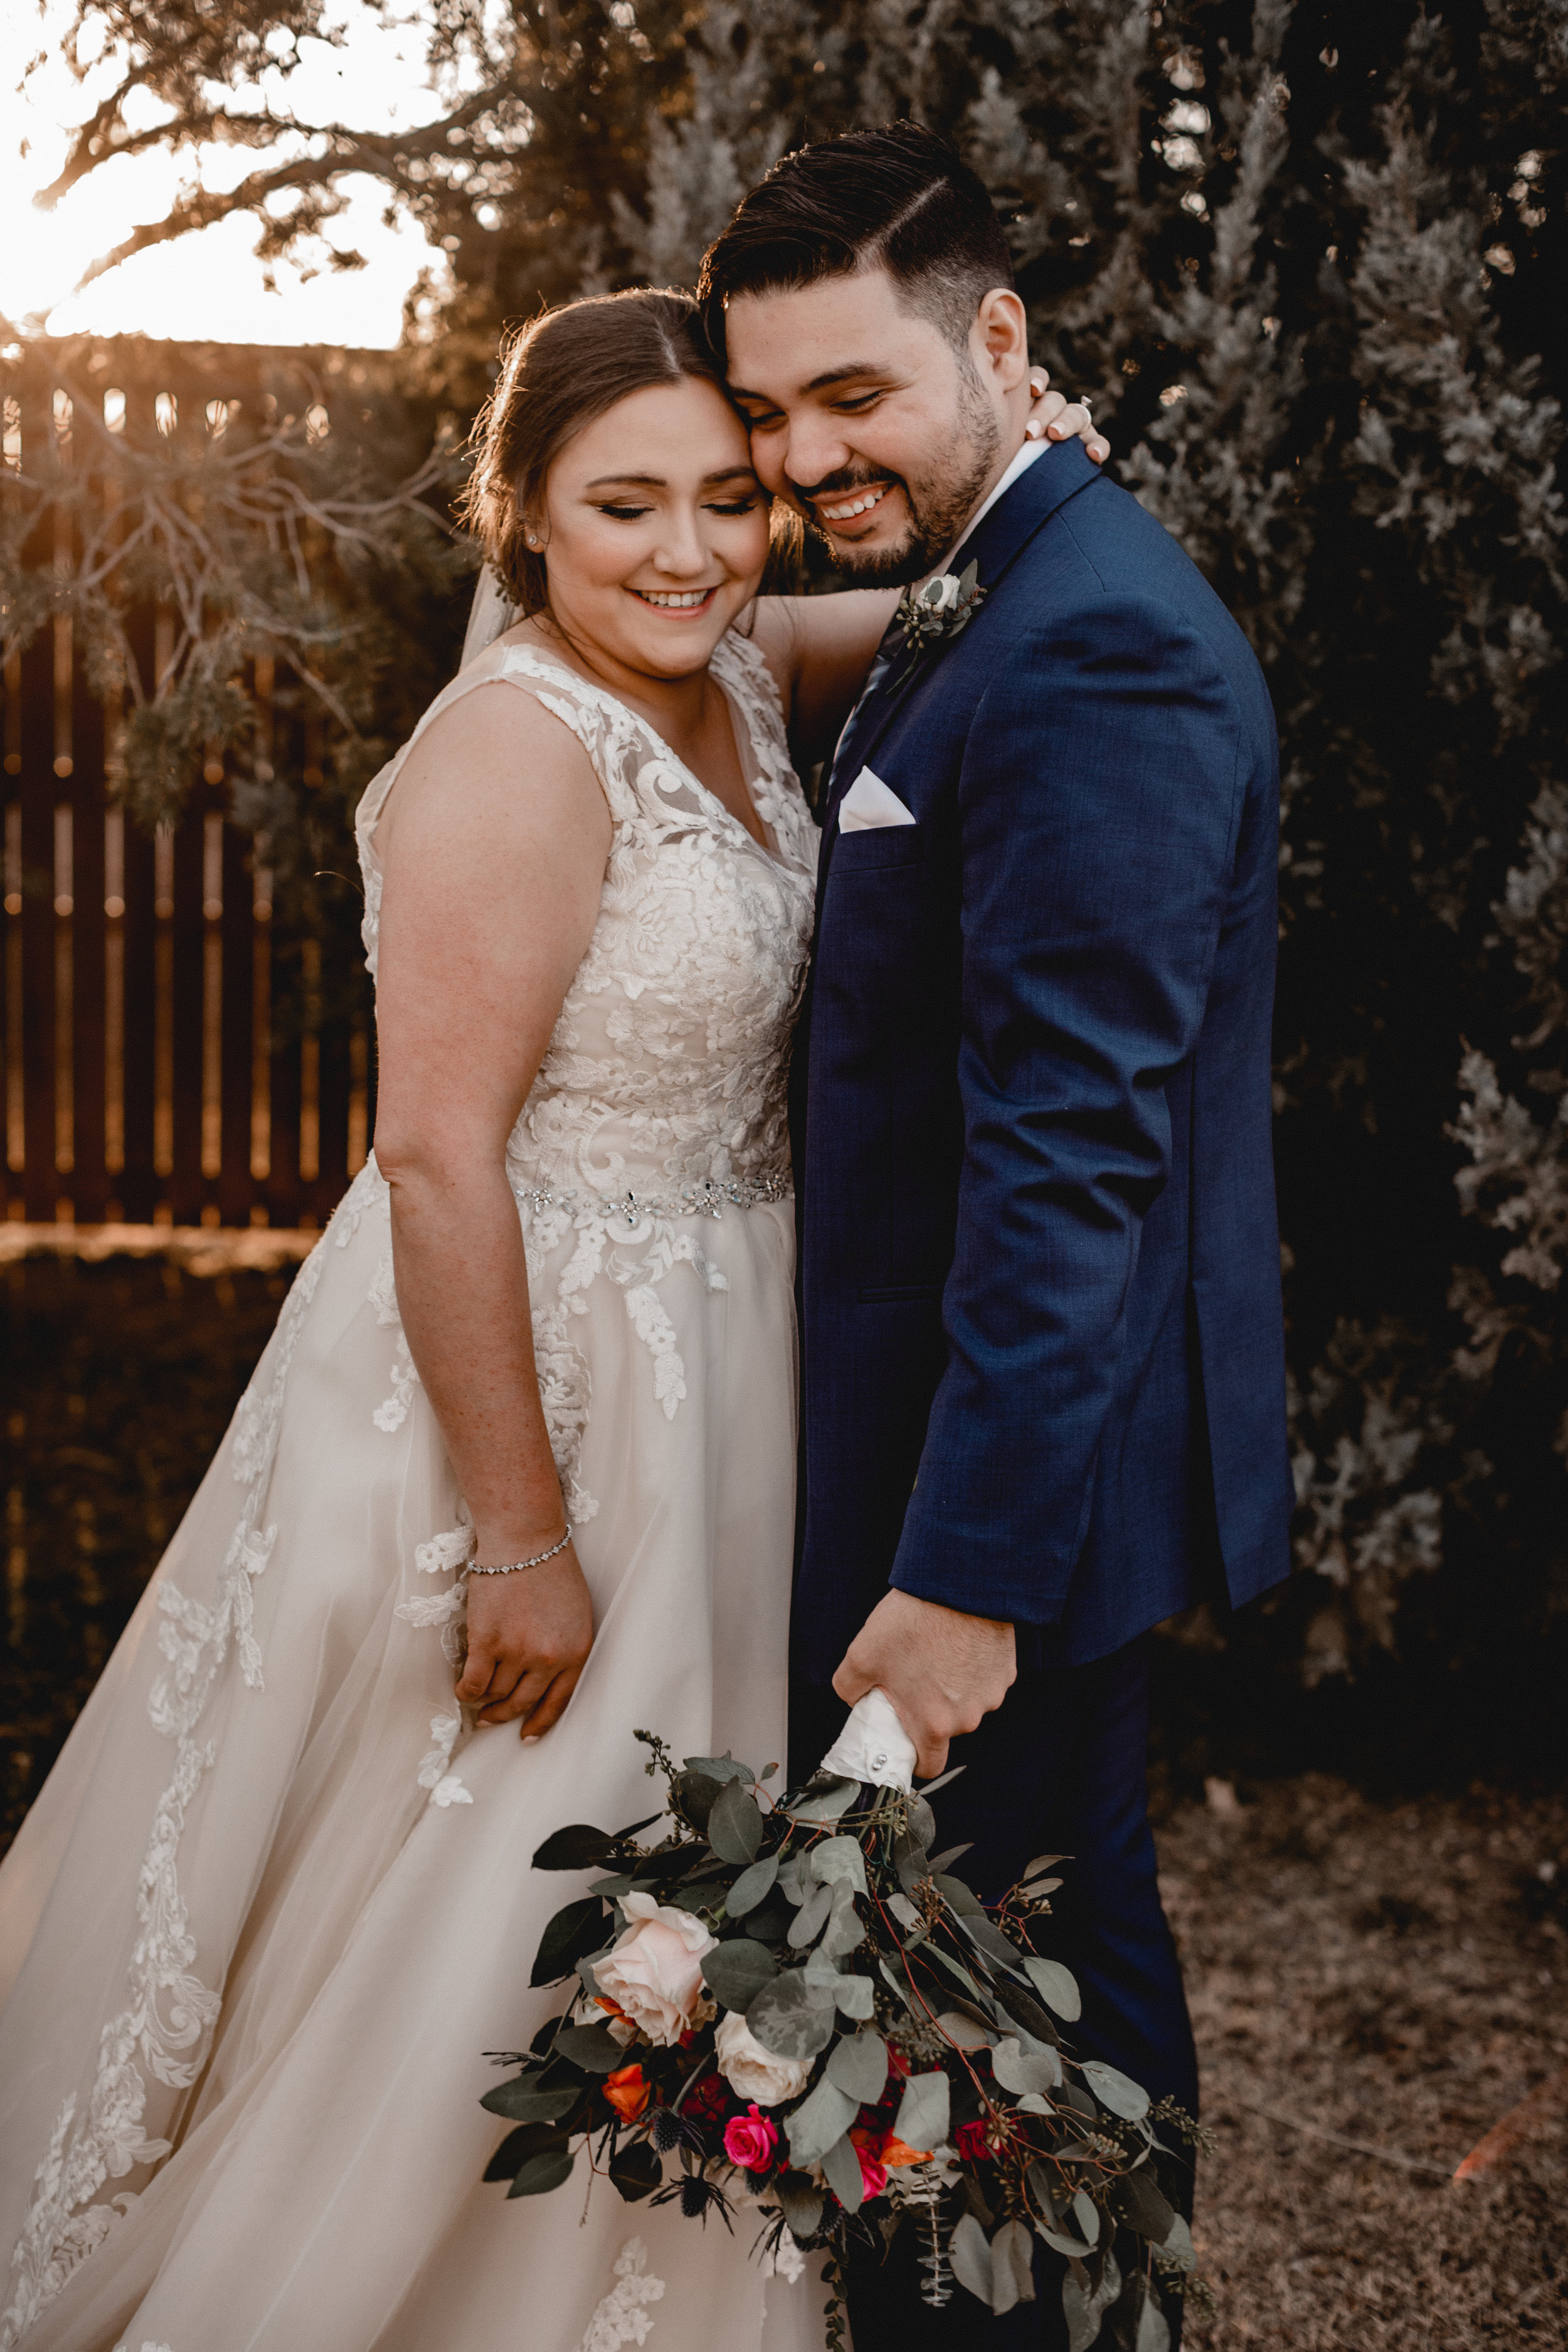 Newlyweds-52.jpg